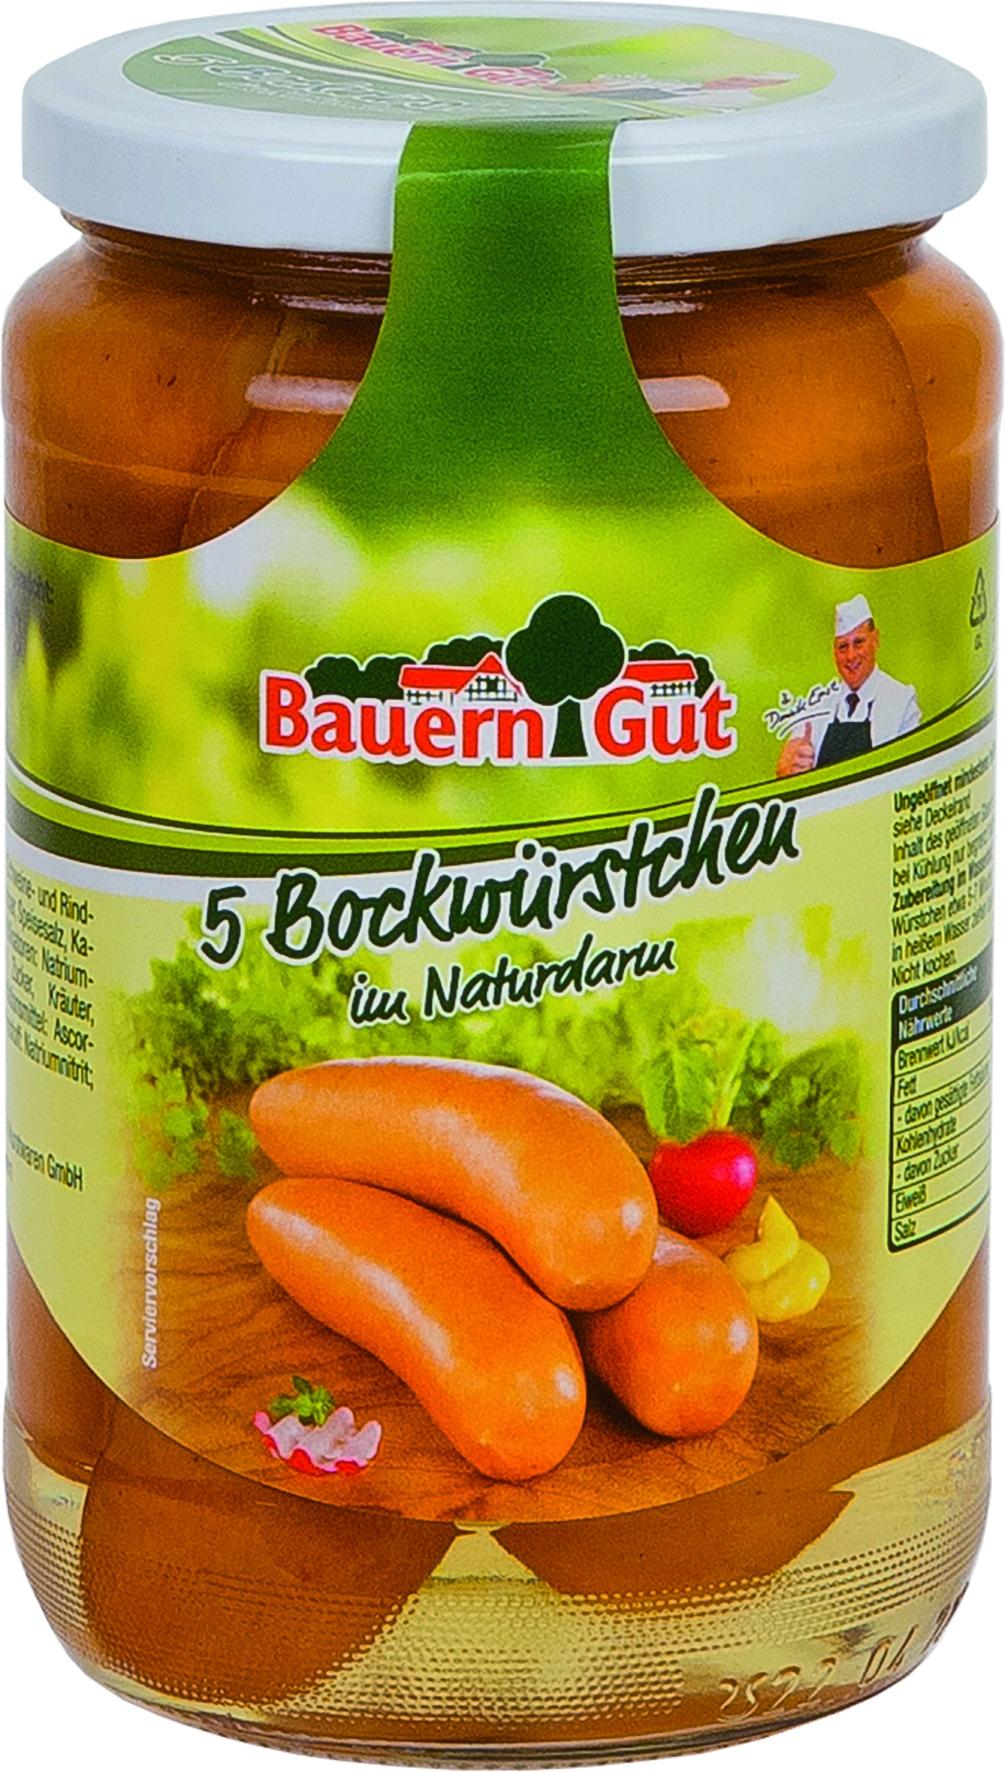 Bockwurst in Naturdarm 5 St = 400 gr